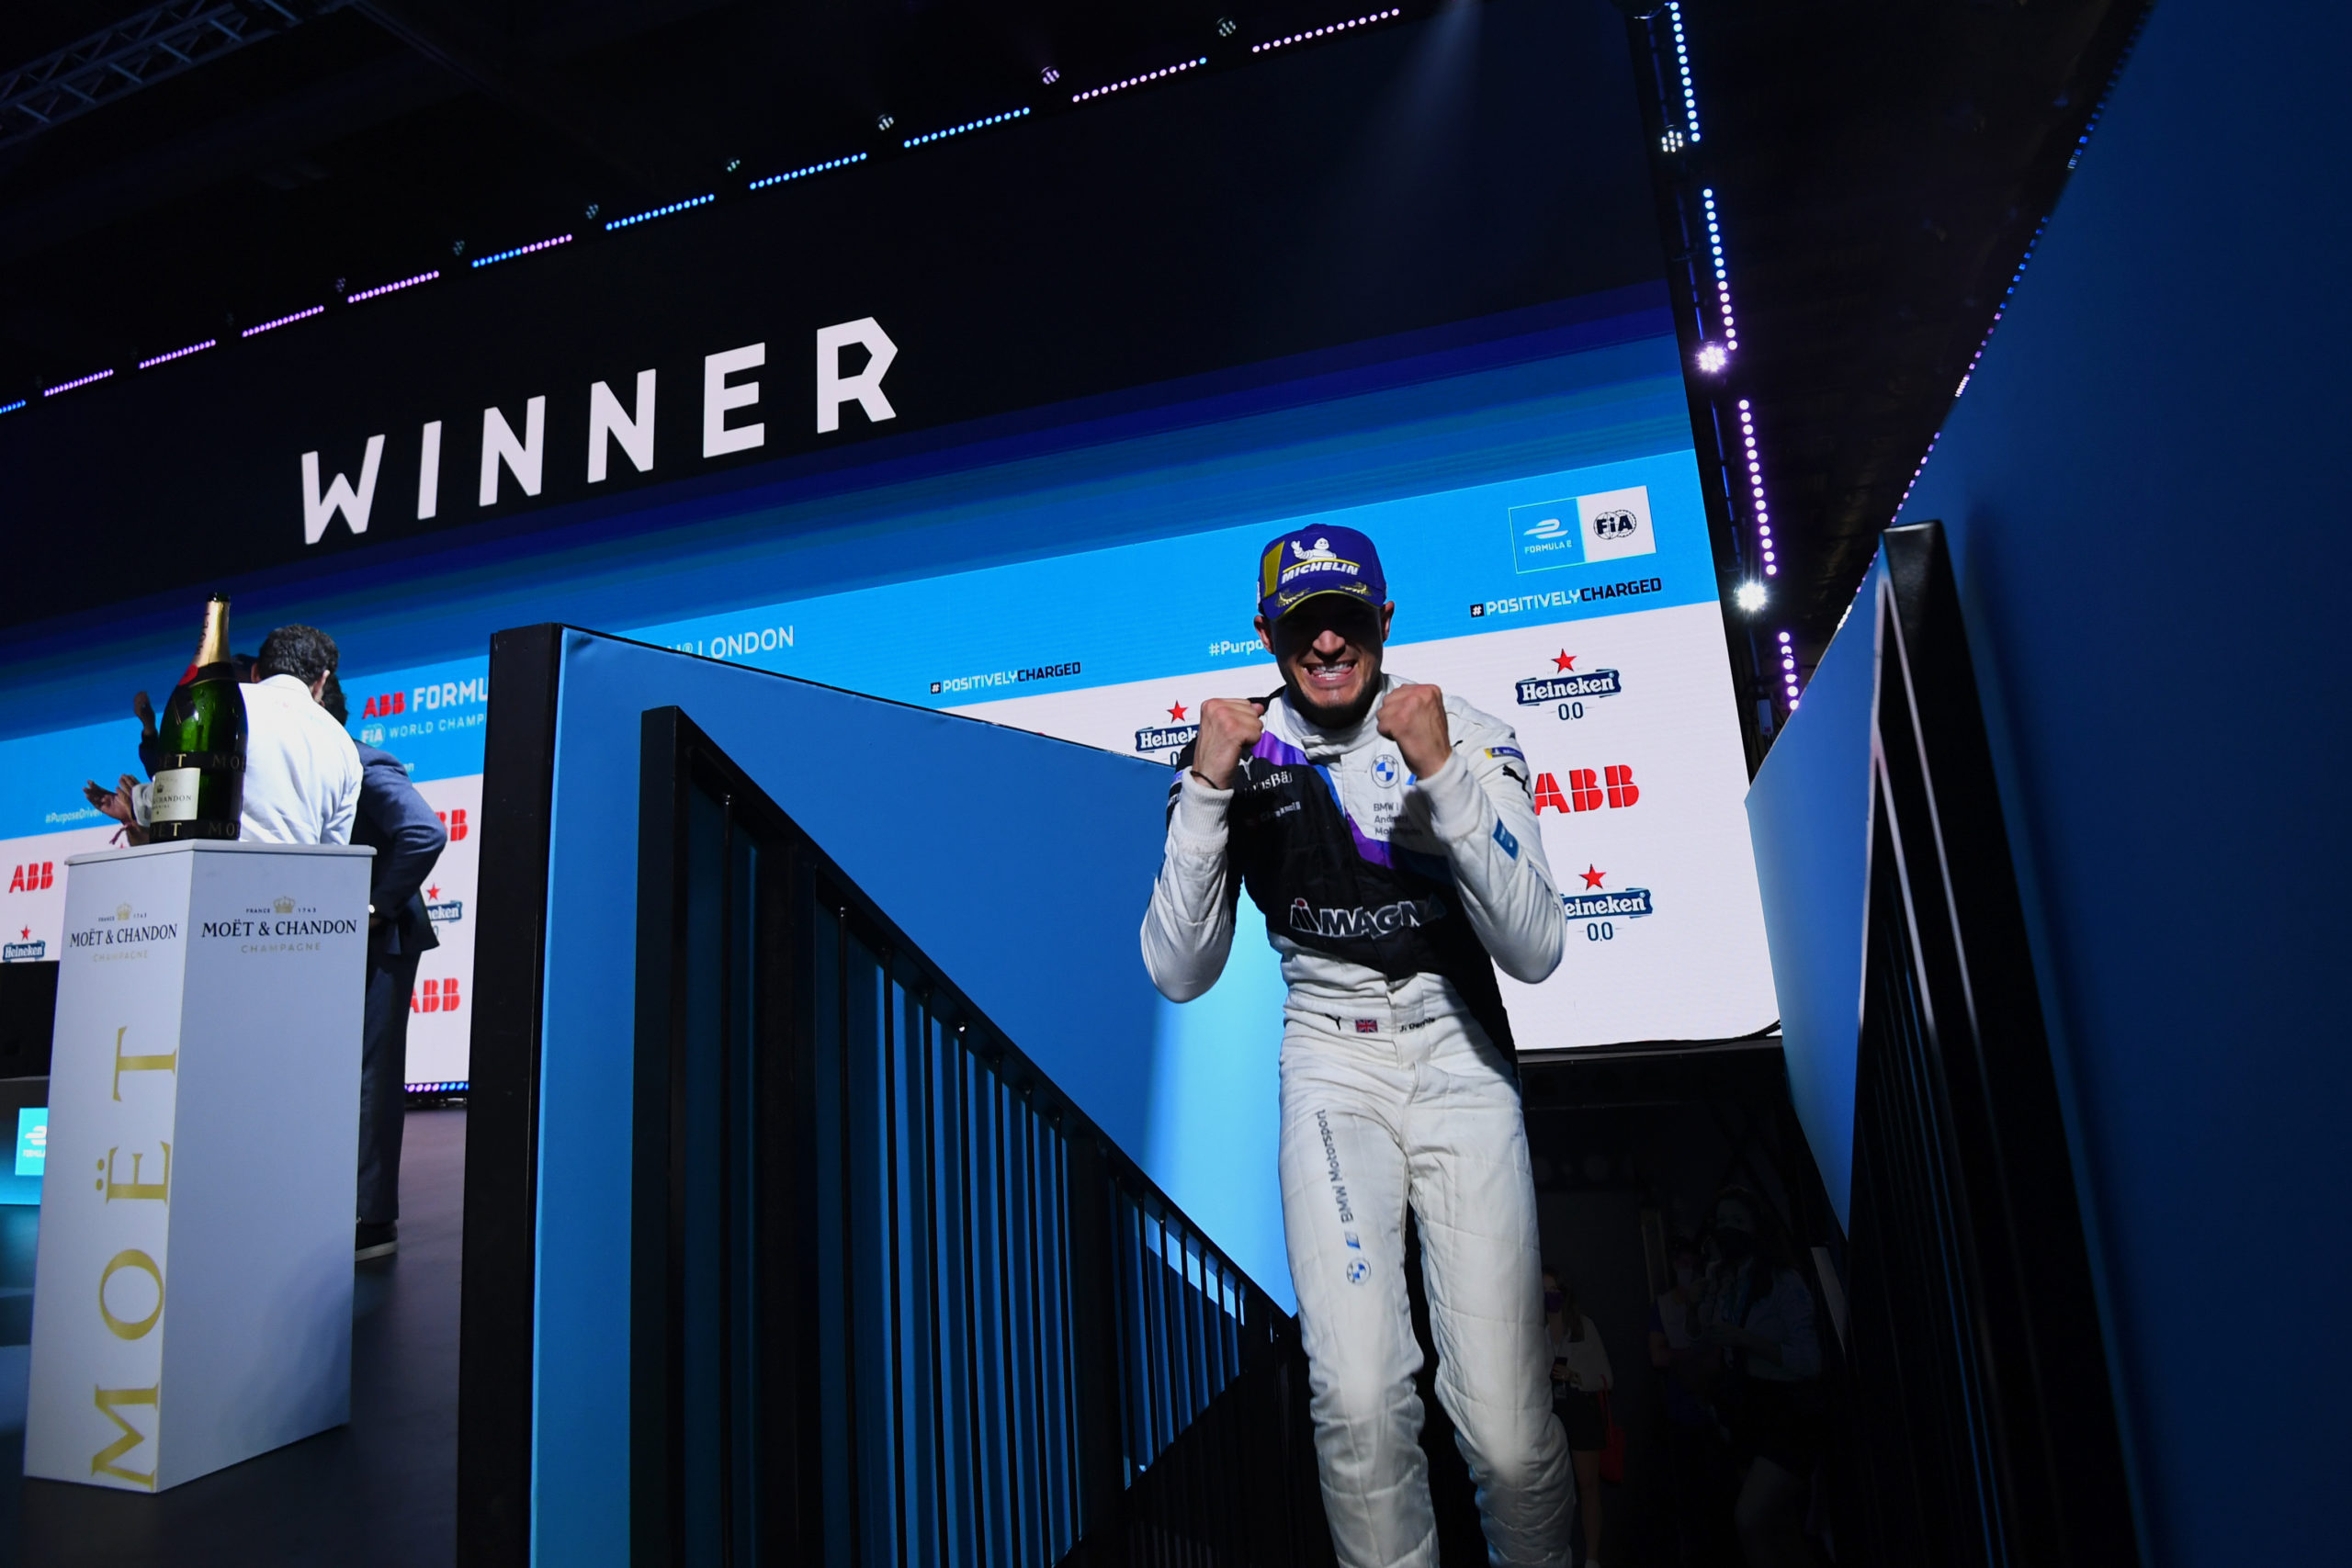 Jake Dennis (GBR), BMW I Andretti Motorsport, 1st position, celebrates on the podium